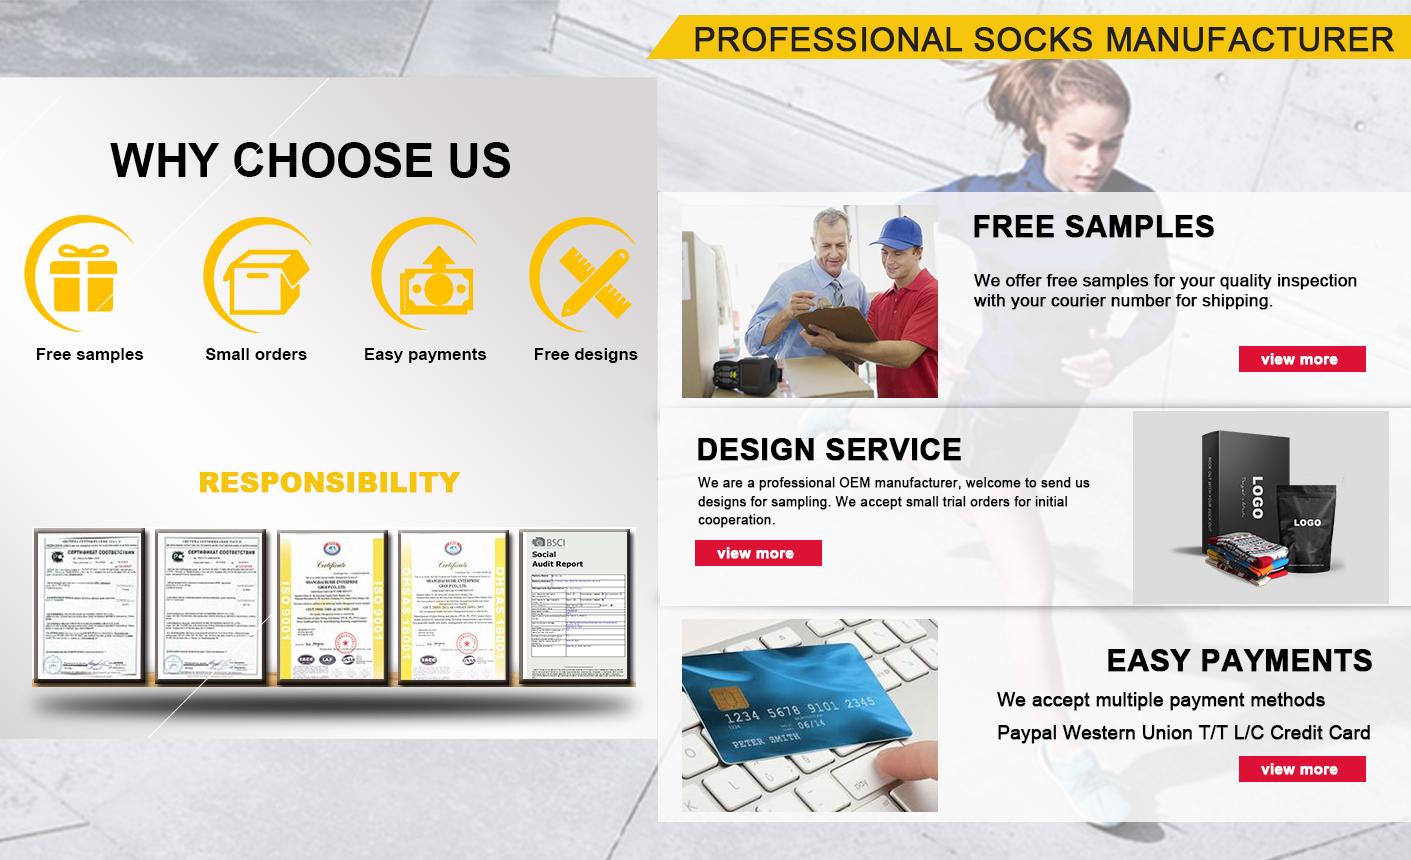 DS-II-1480 army sock vietnam socks military cotton socks